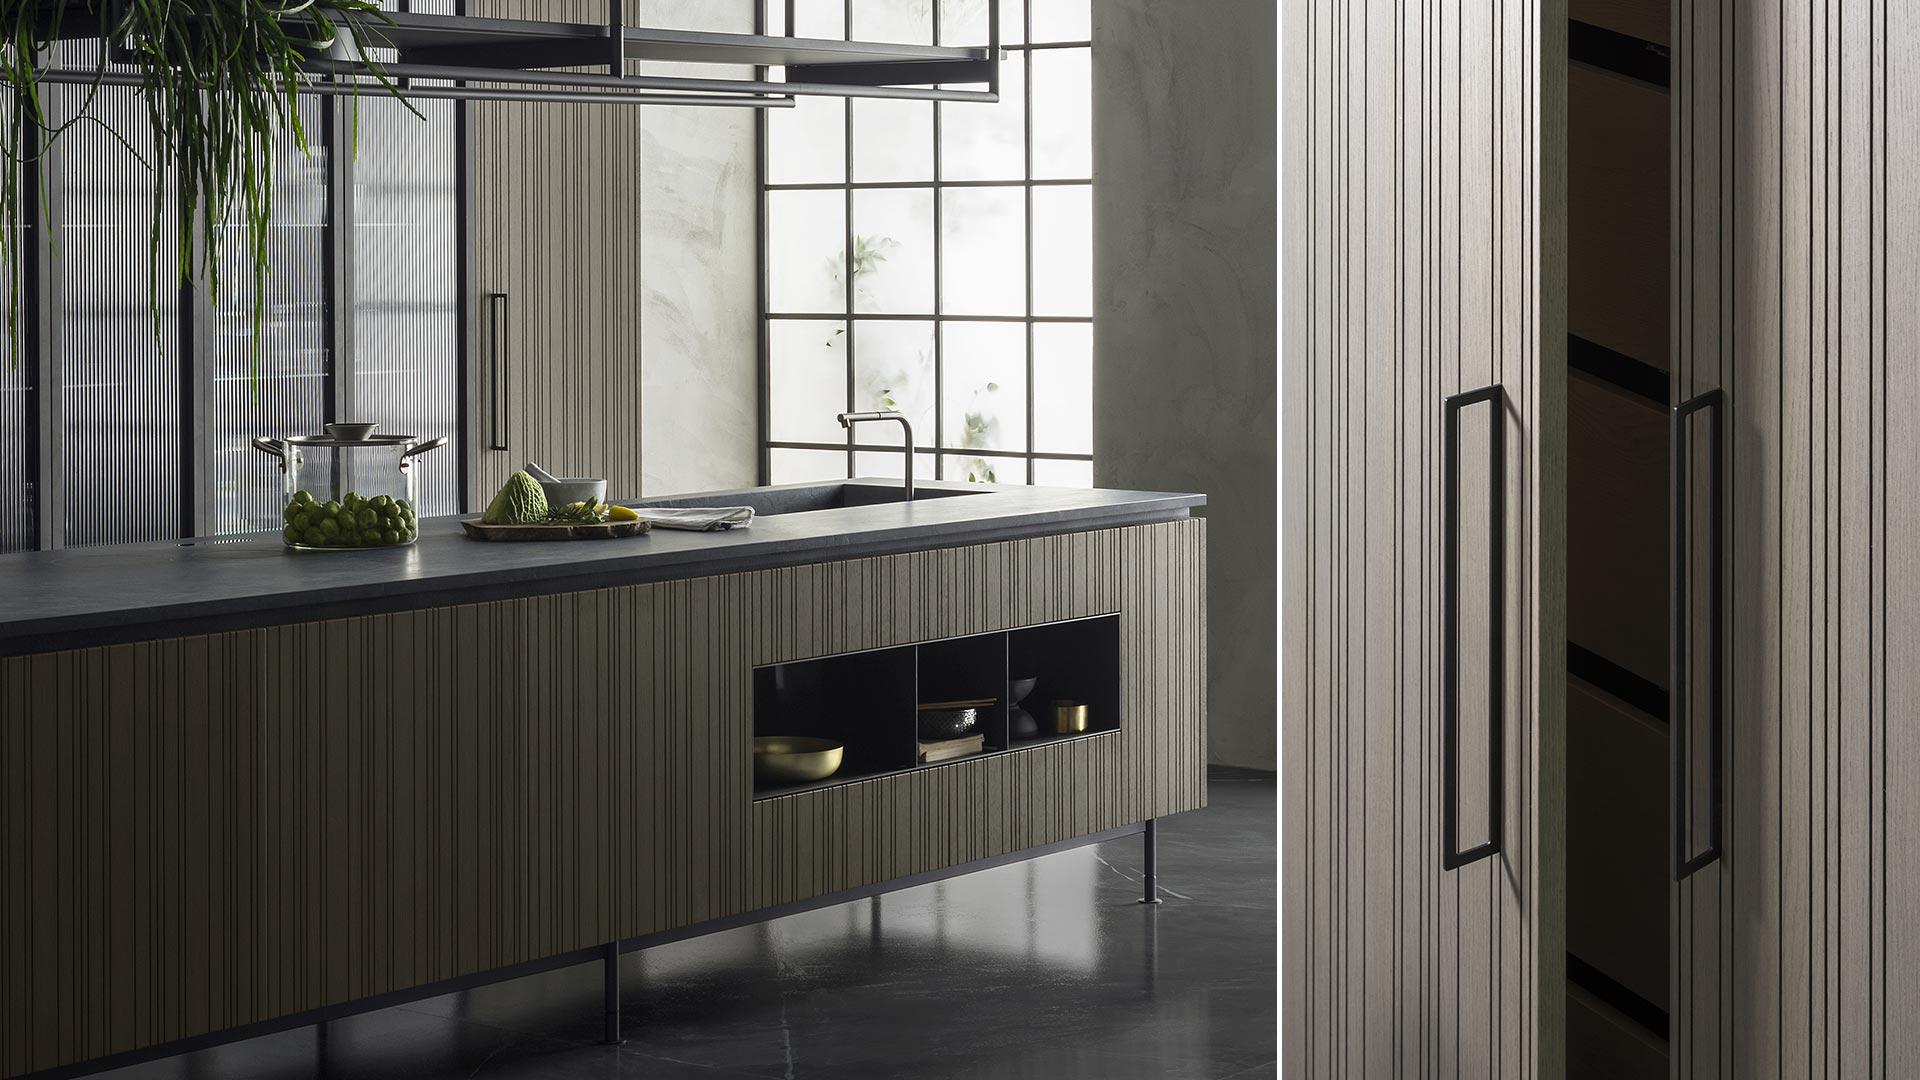 Design kitchen, wood kitchen - Collection RUA - TM_MI2018_Rua_004